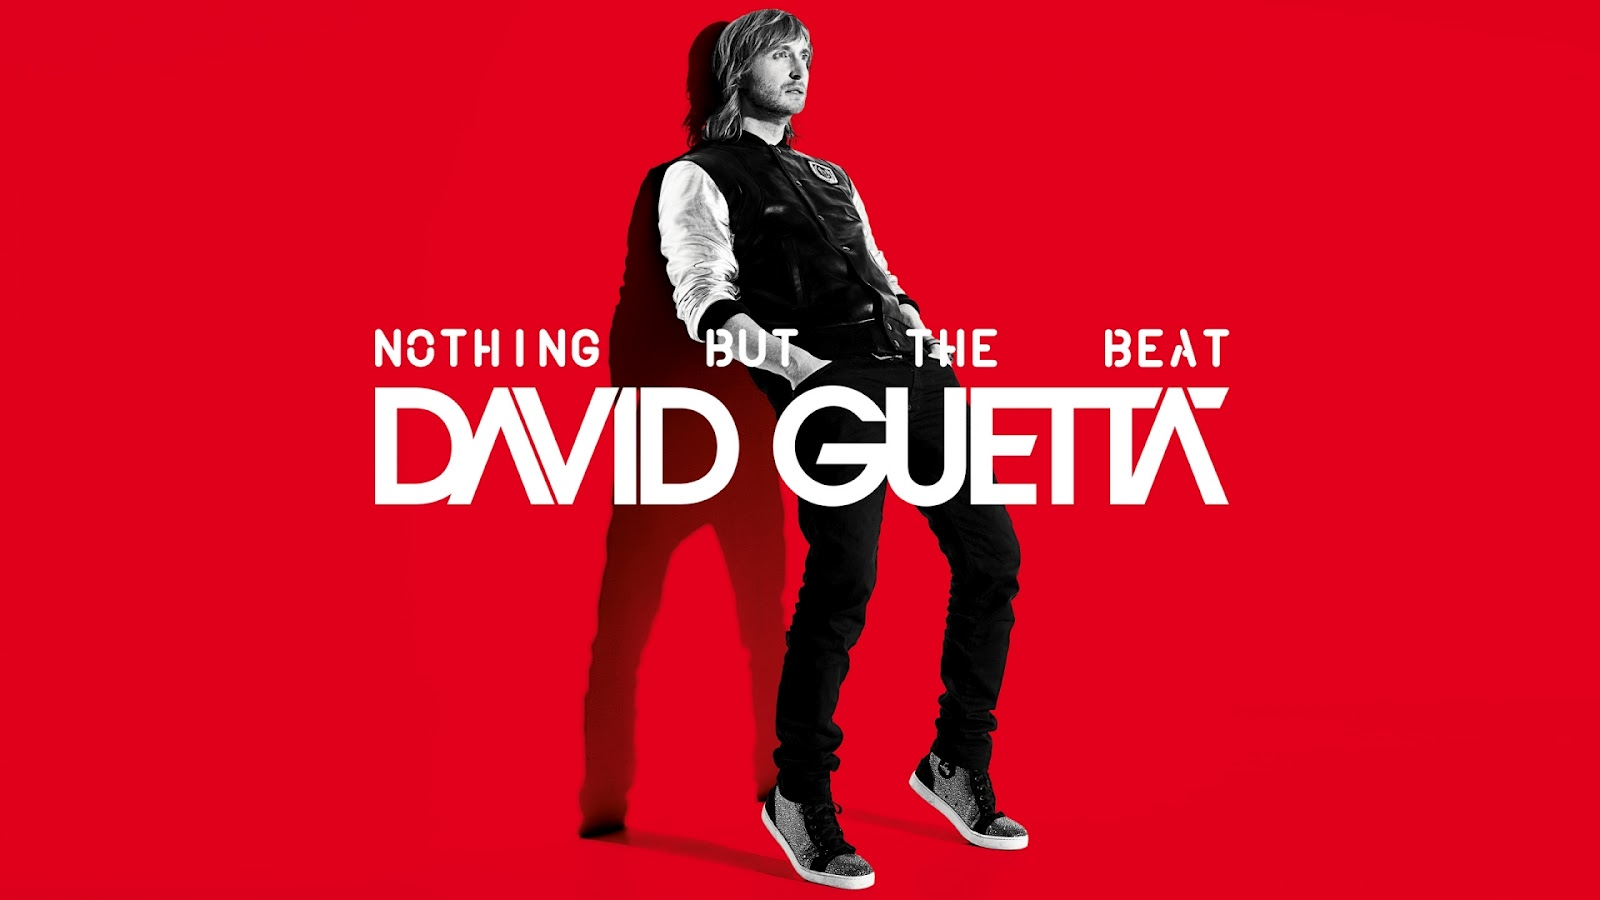 30 Best David Guetta Photographs Which is Rocking | HDpixels